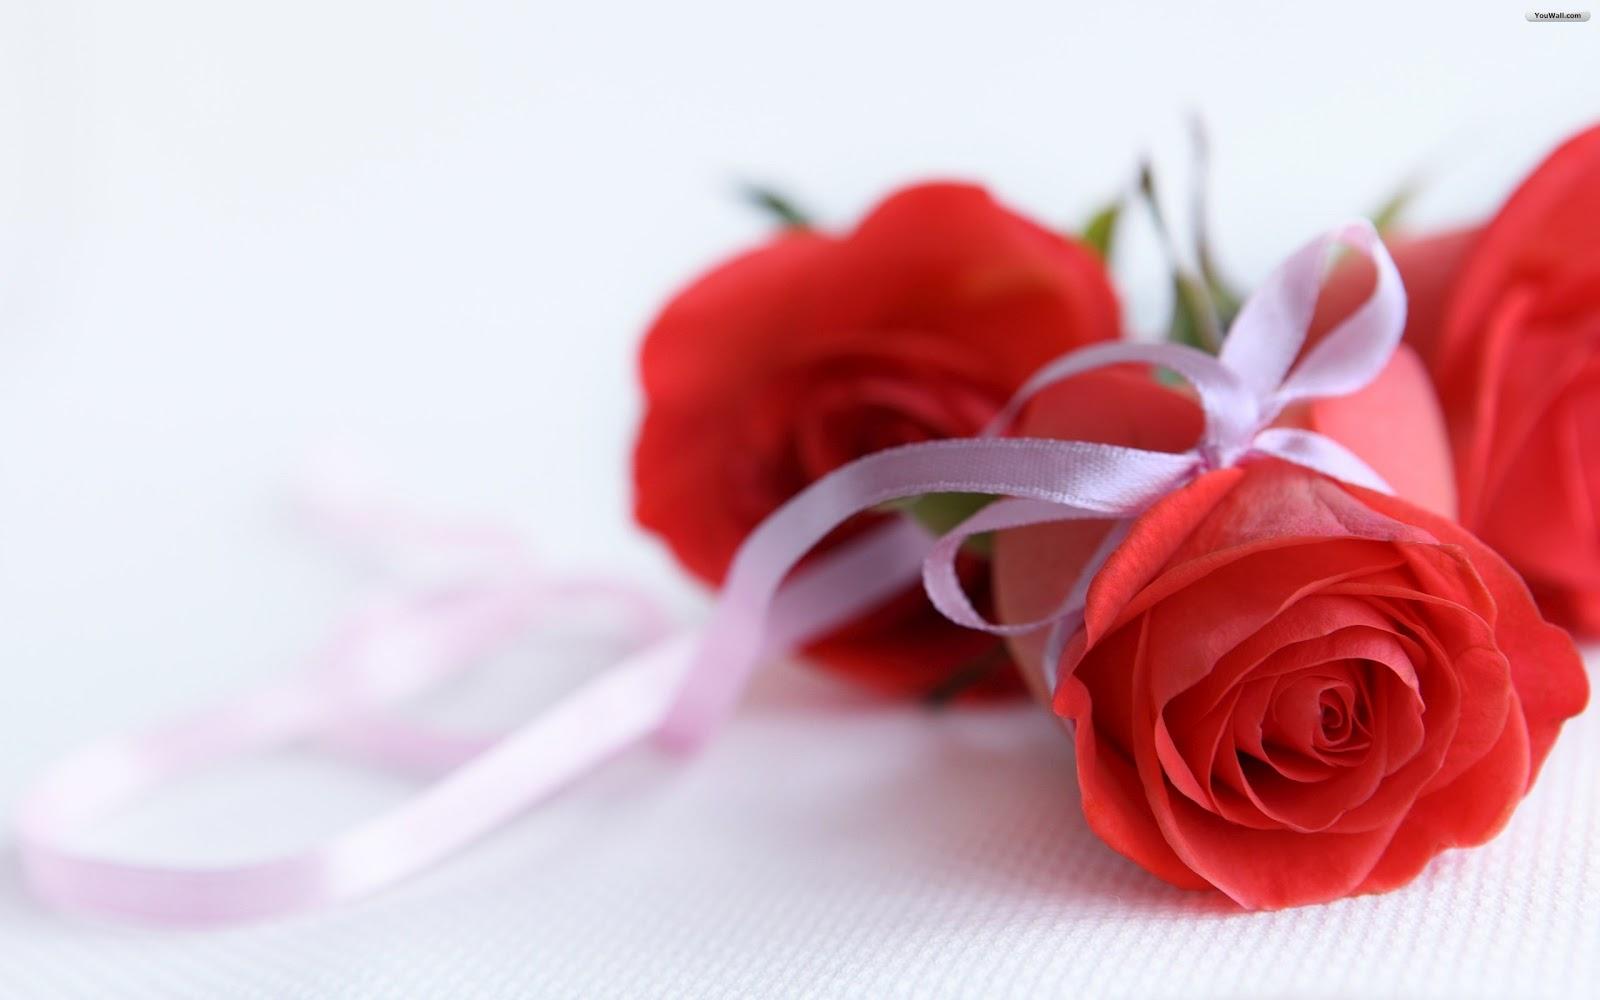 cute rose pictures. Black Bedroom Furniture Sets. Home Design Ideas